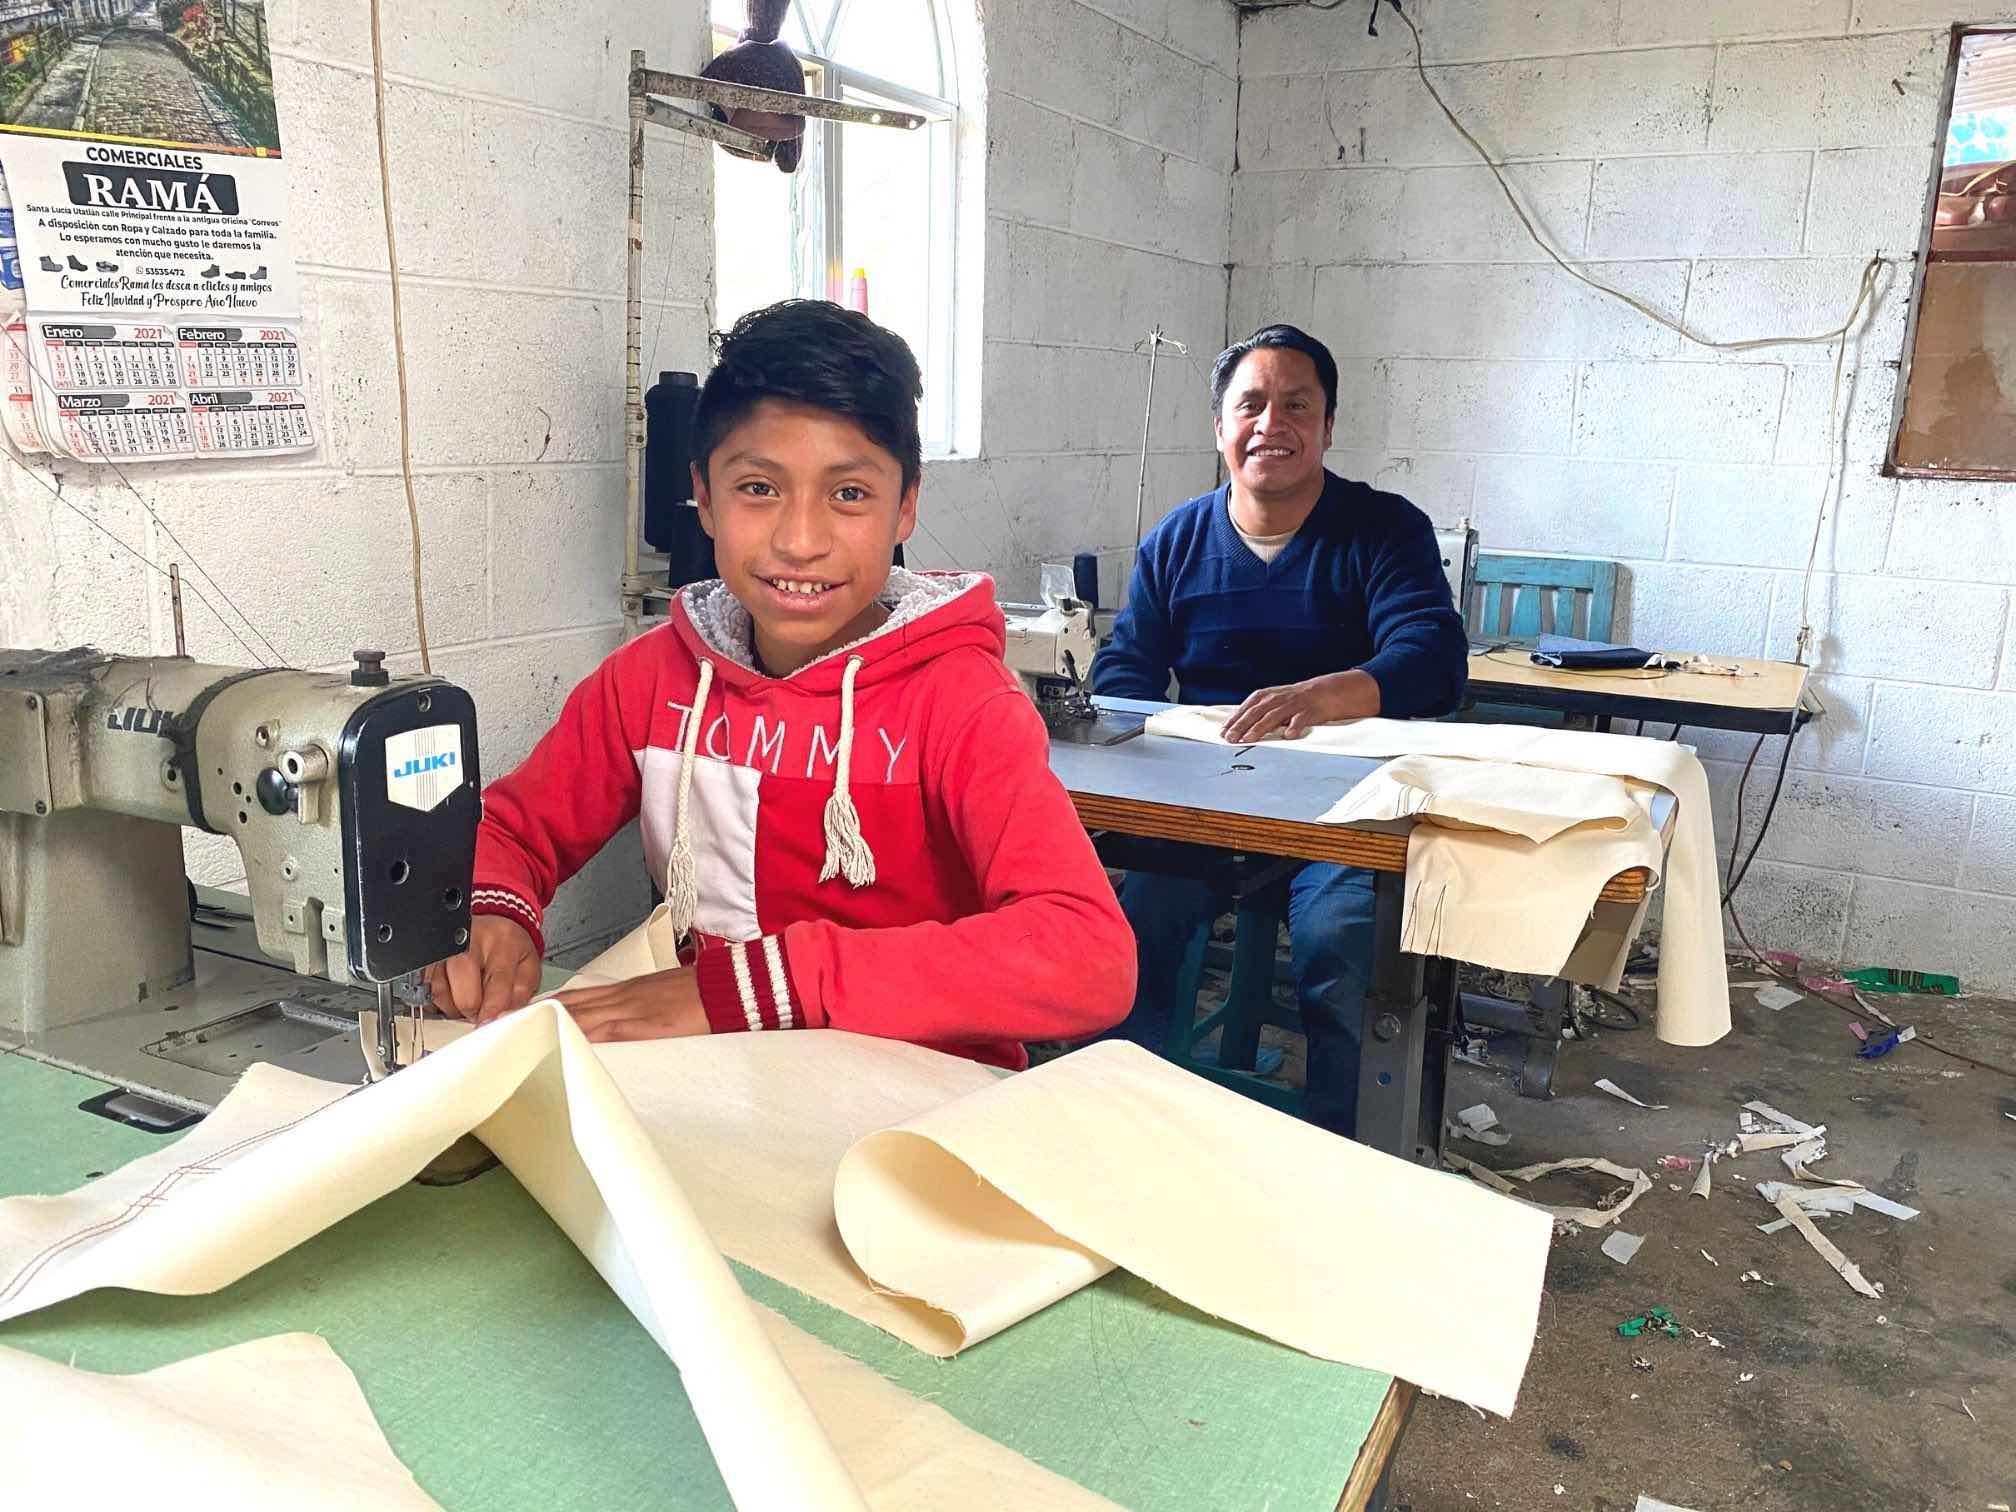 Guatemalan boy uses sewing machine in workshop